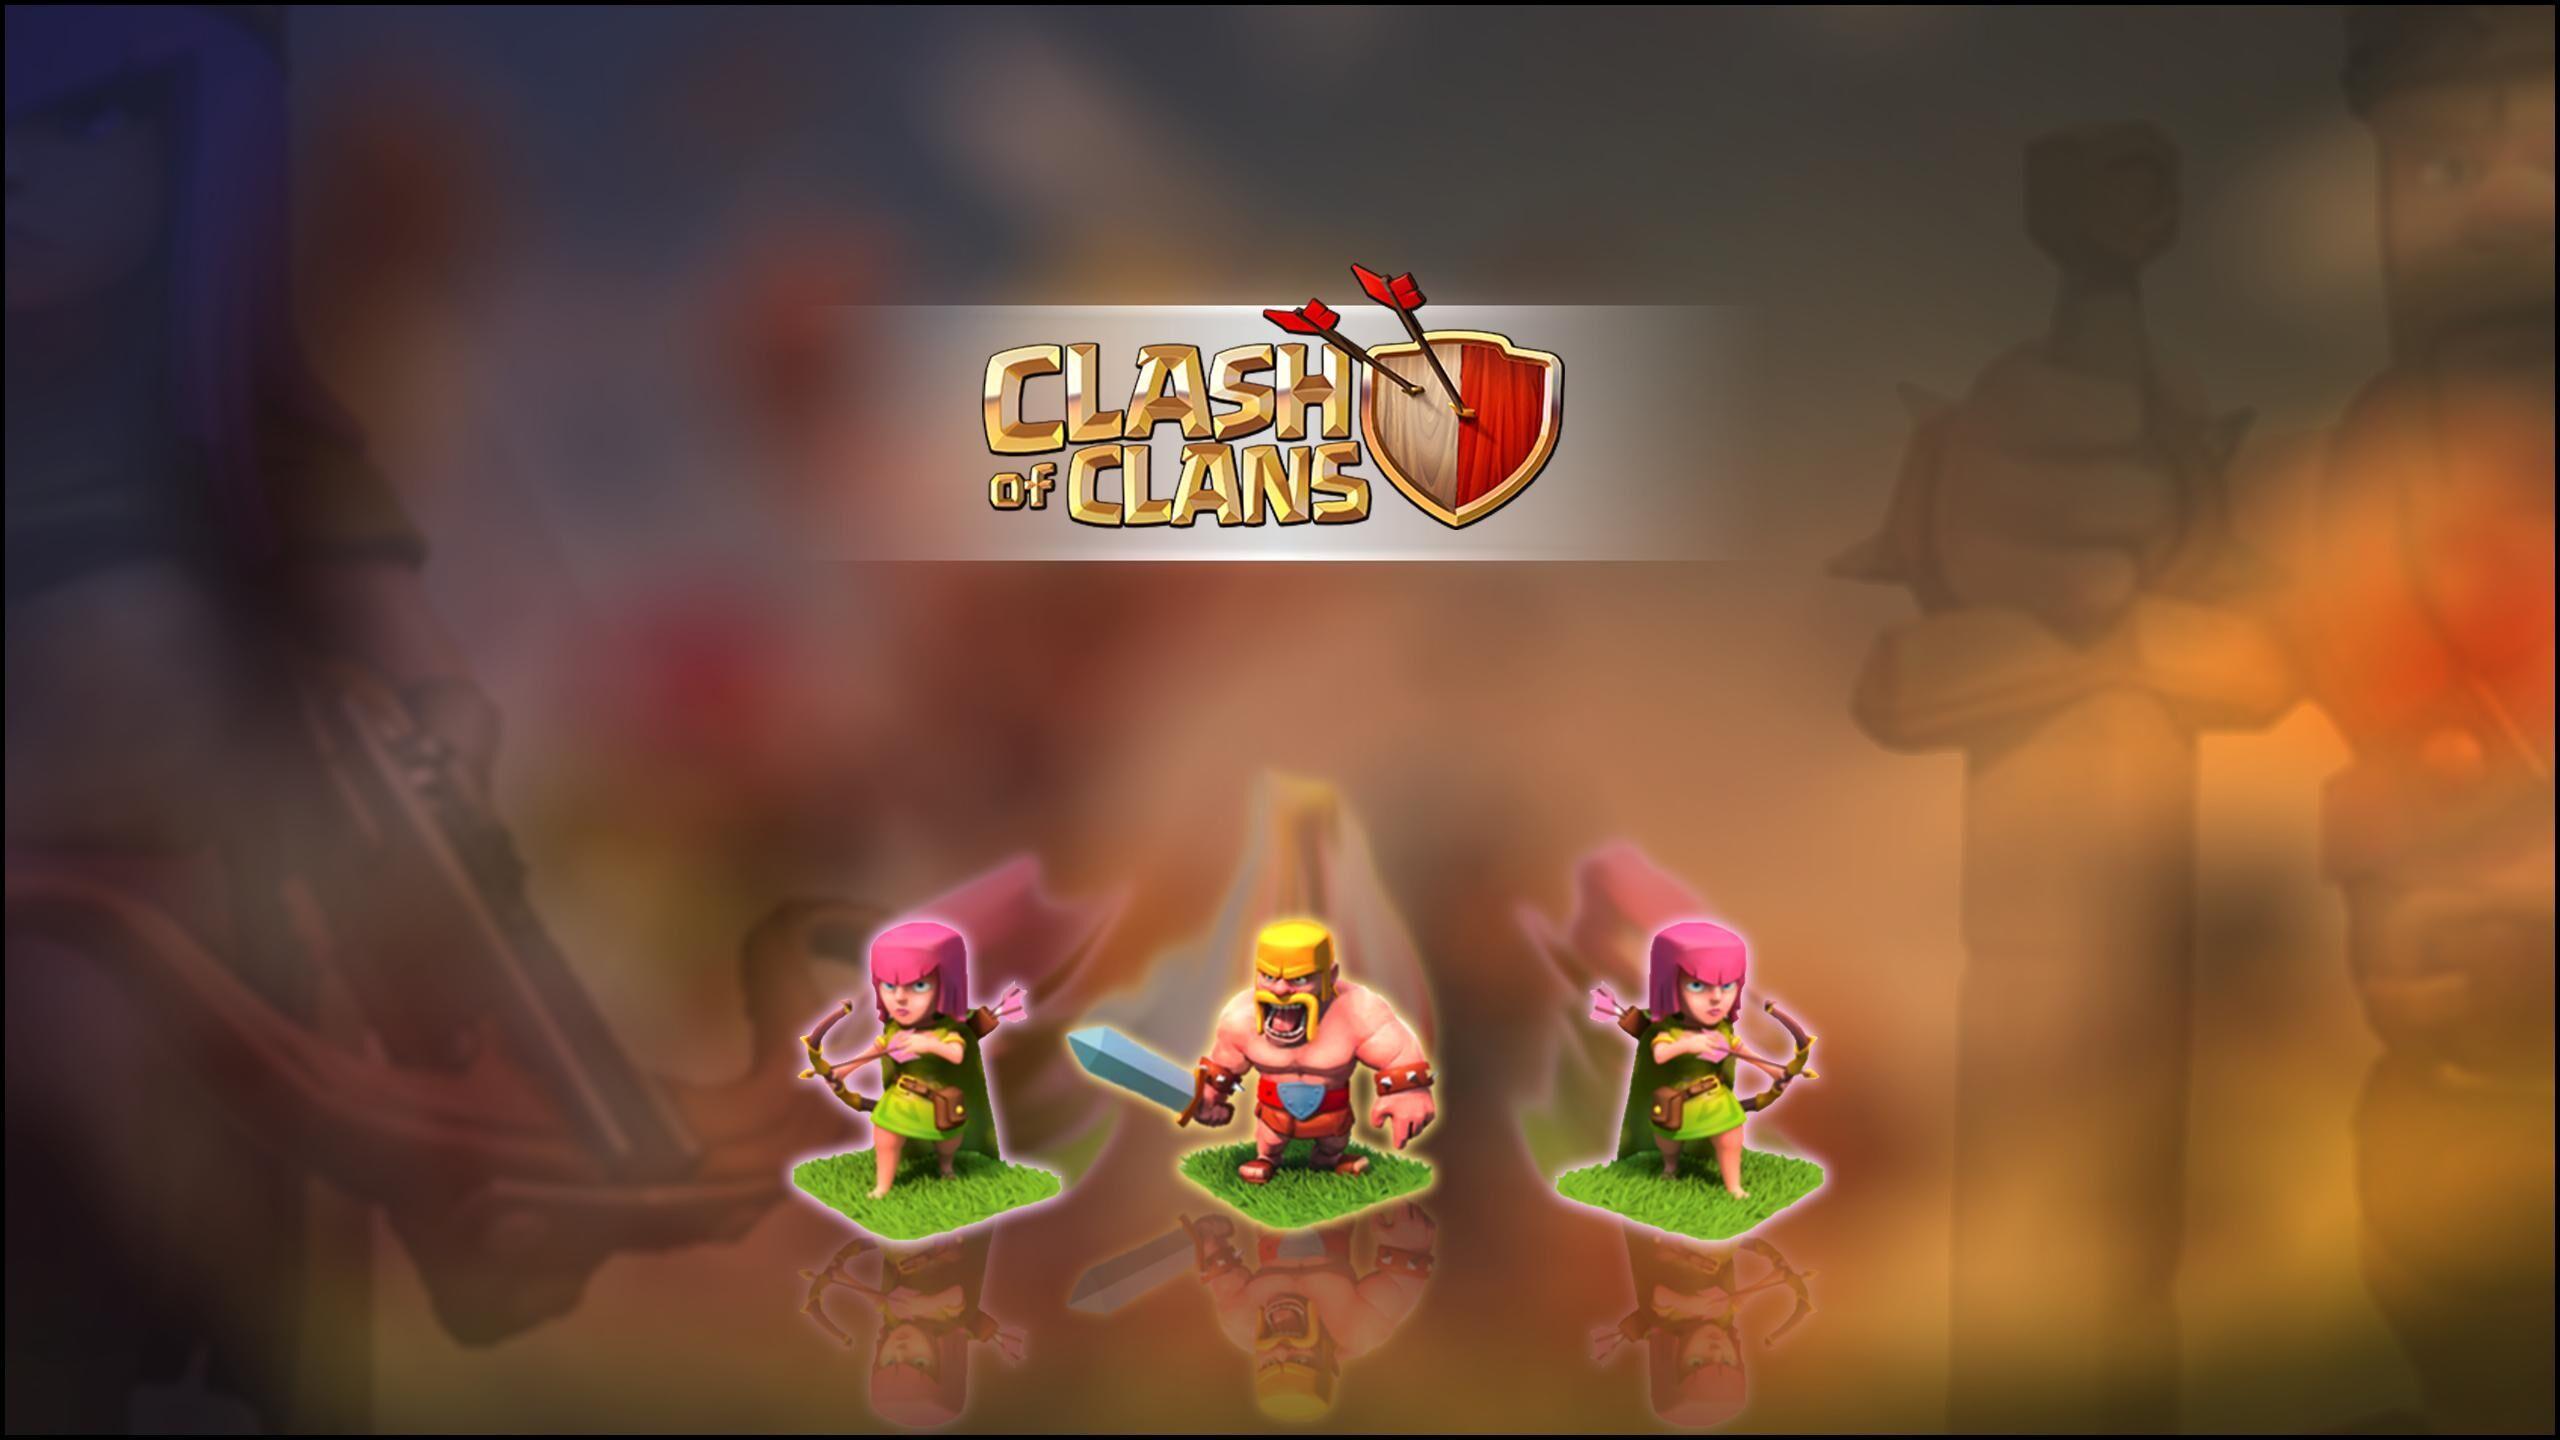 60 Wallpaper HD Android Clash Of Clans COC Terbaru Part 1